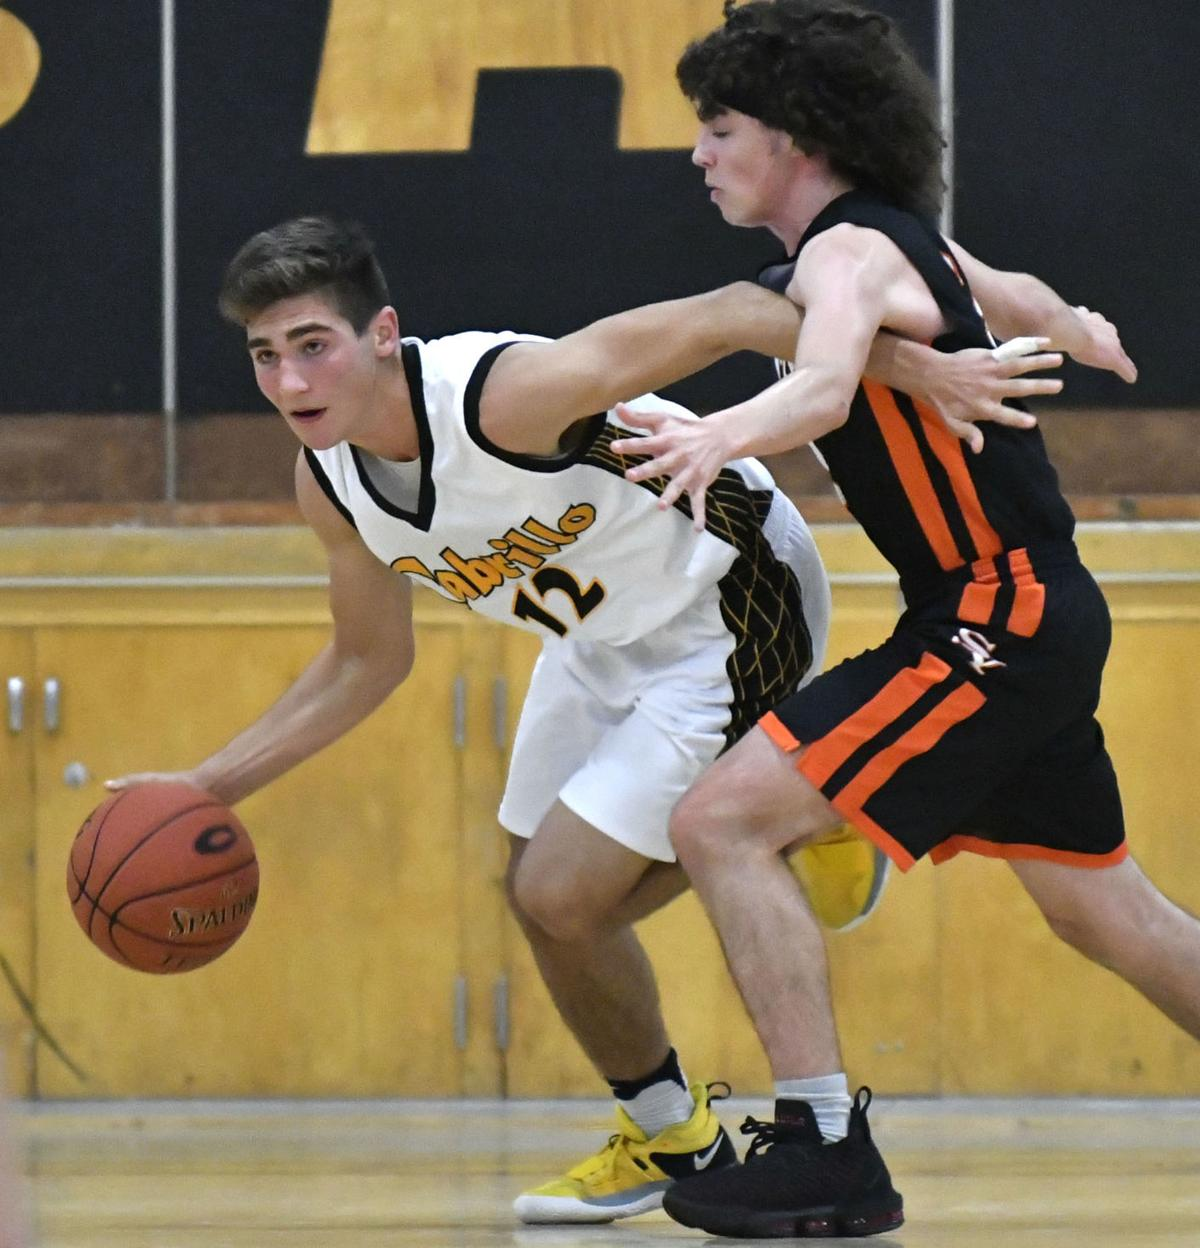 121818 SY CHS boys basketball 12.jpg